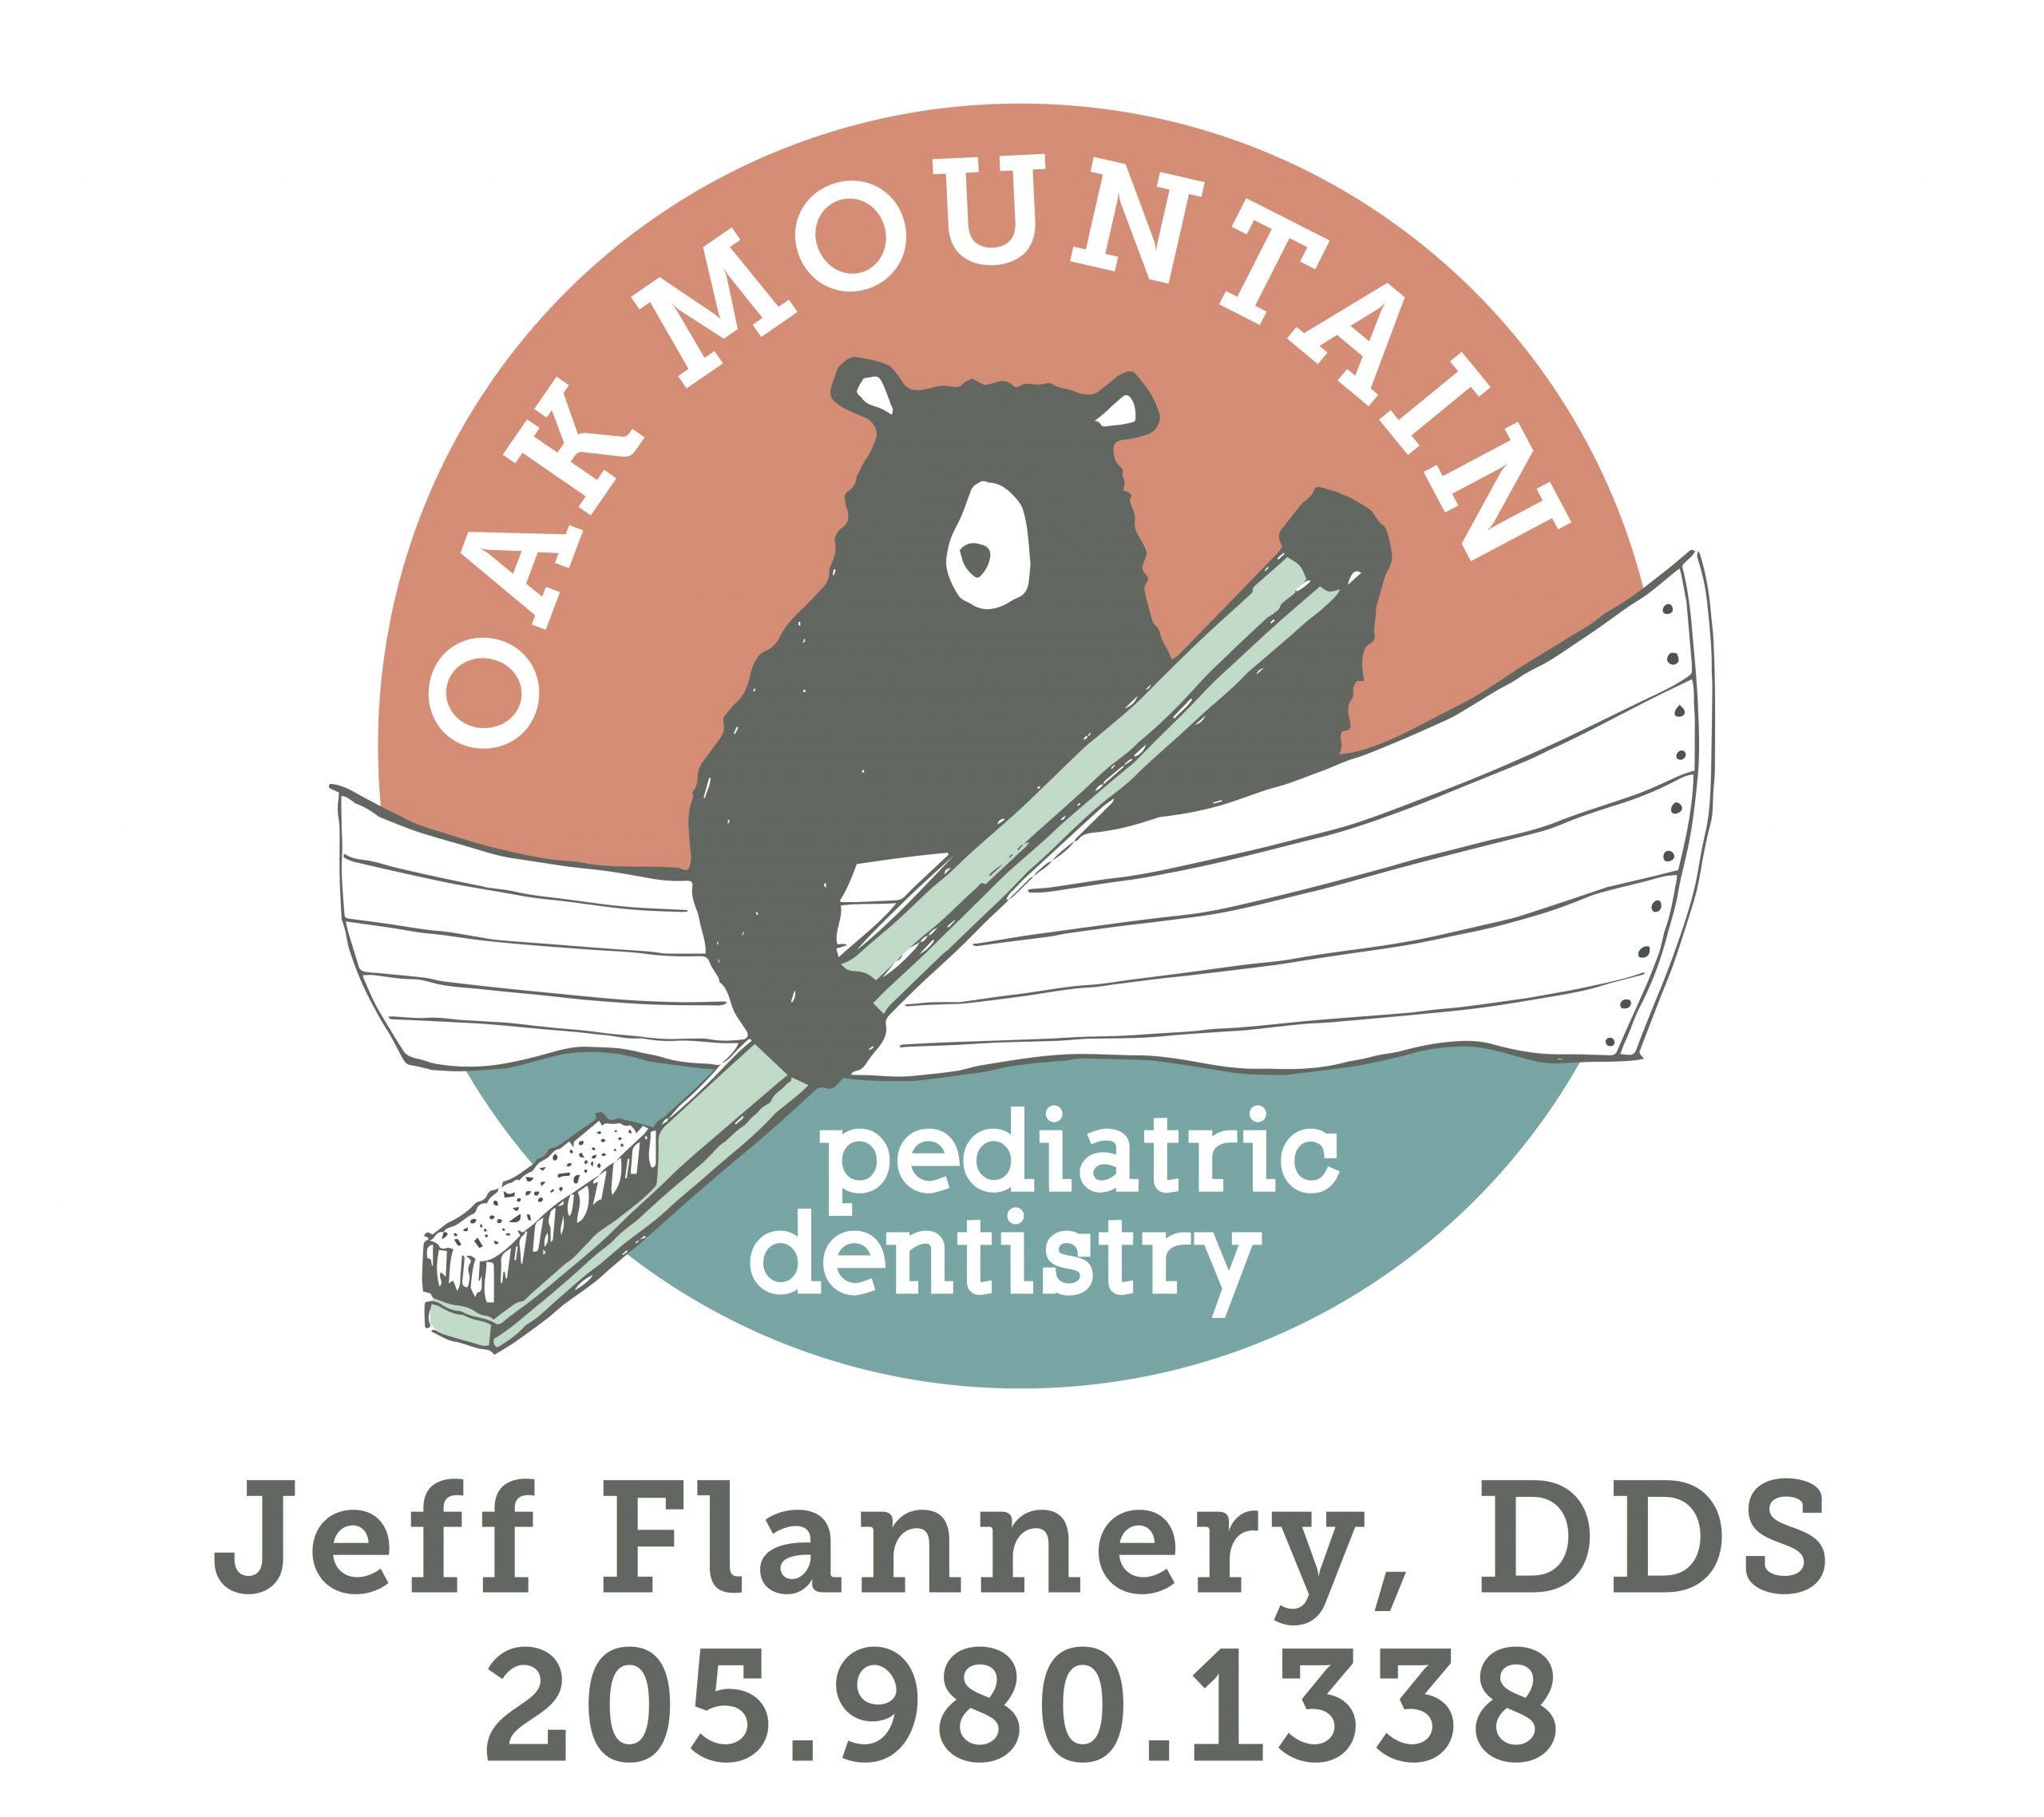 Oak Mountain Pediatric Dentistry